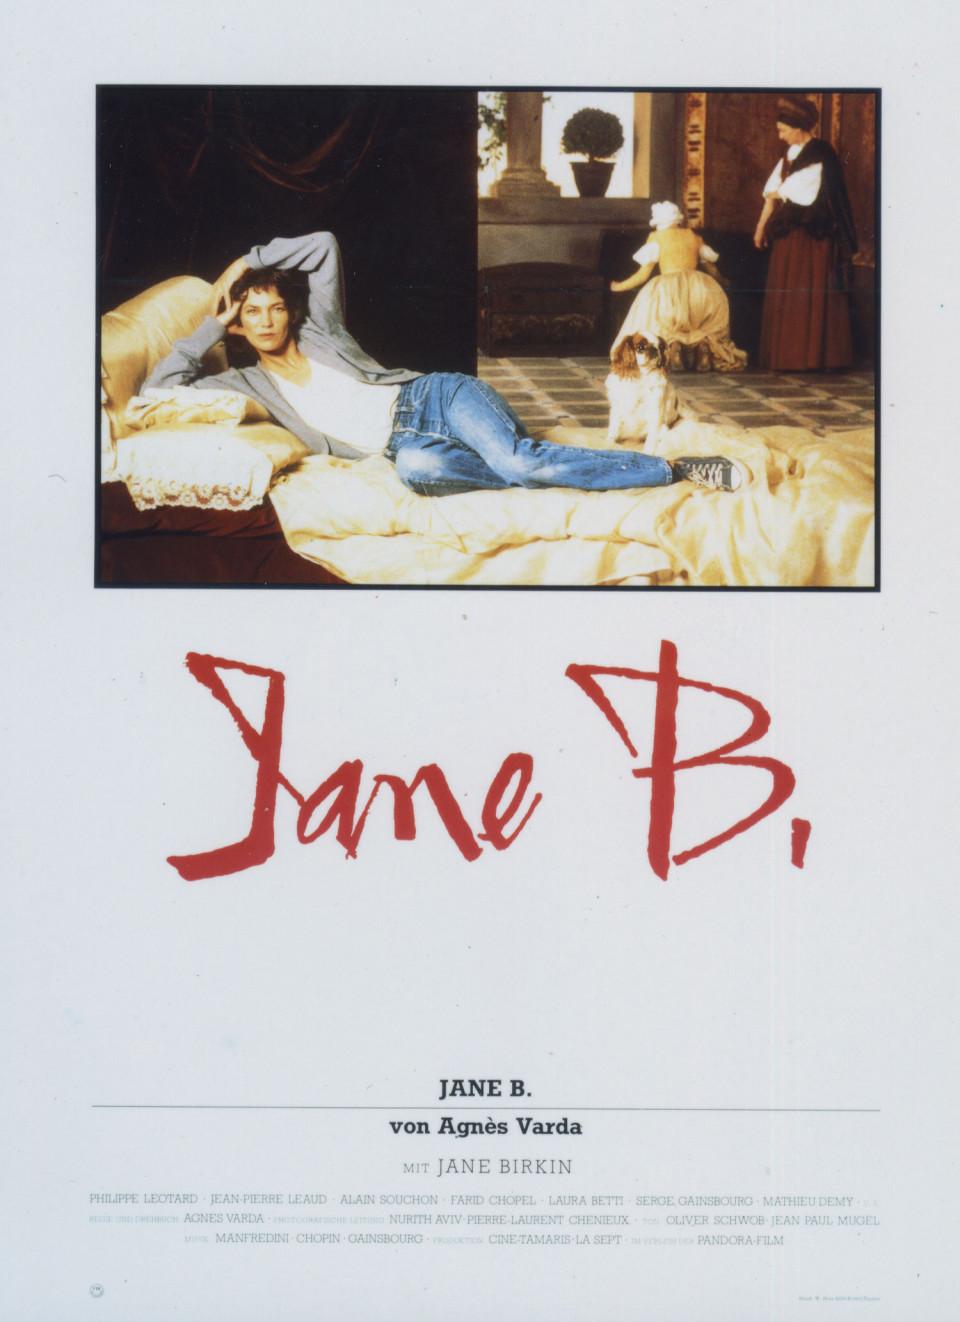 Jane Birkin in Jane B. par Agnès V. (1988)